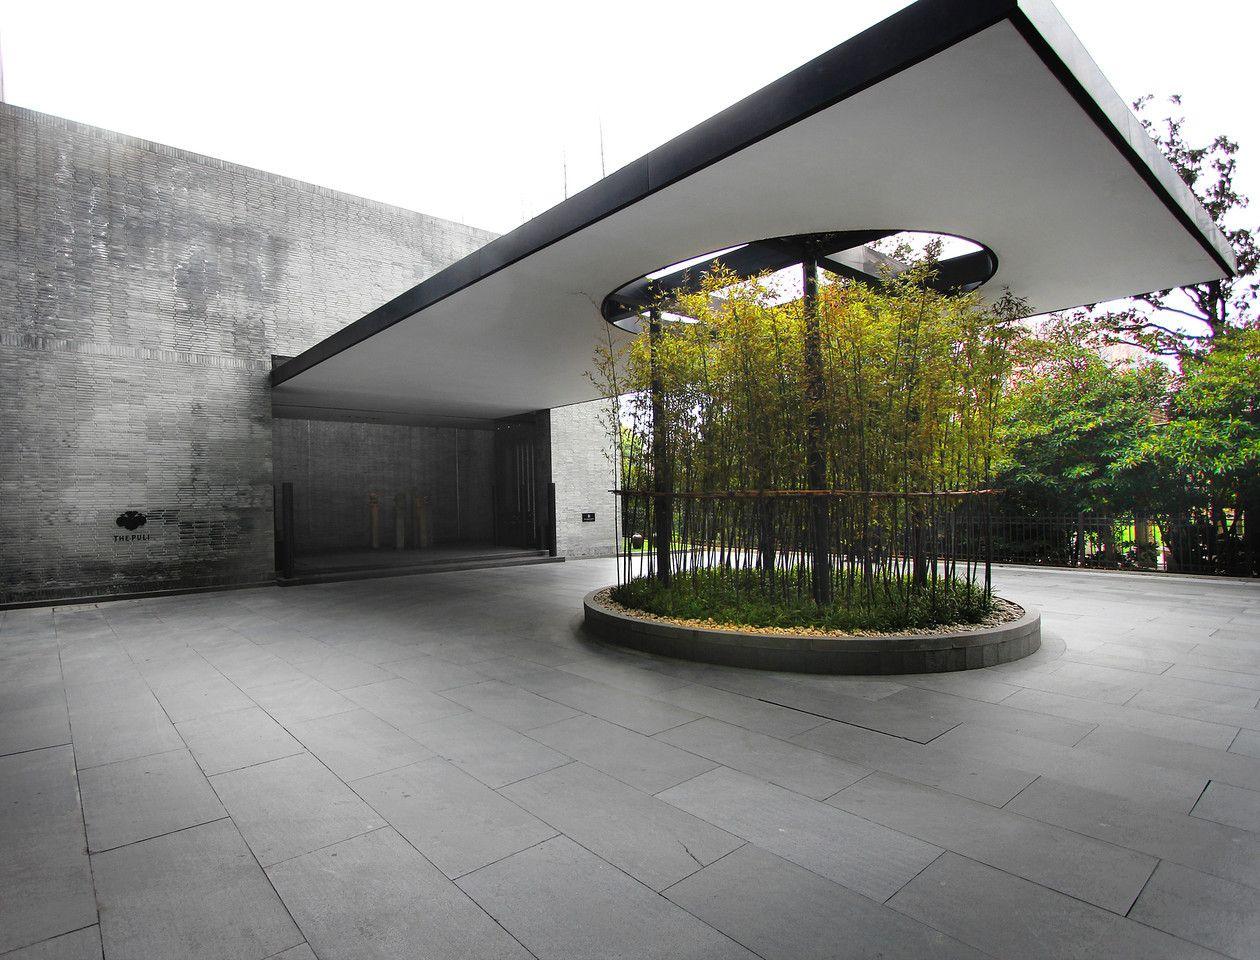 Puli hotel shanghai danielng entrance entrance for Hotel entrance decor